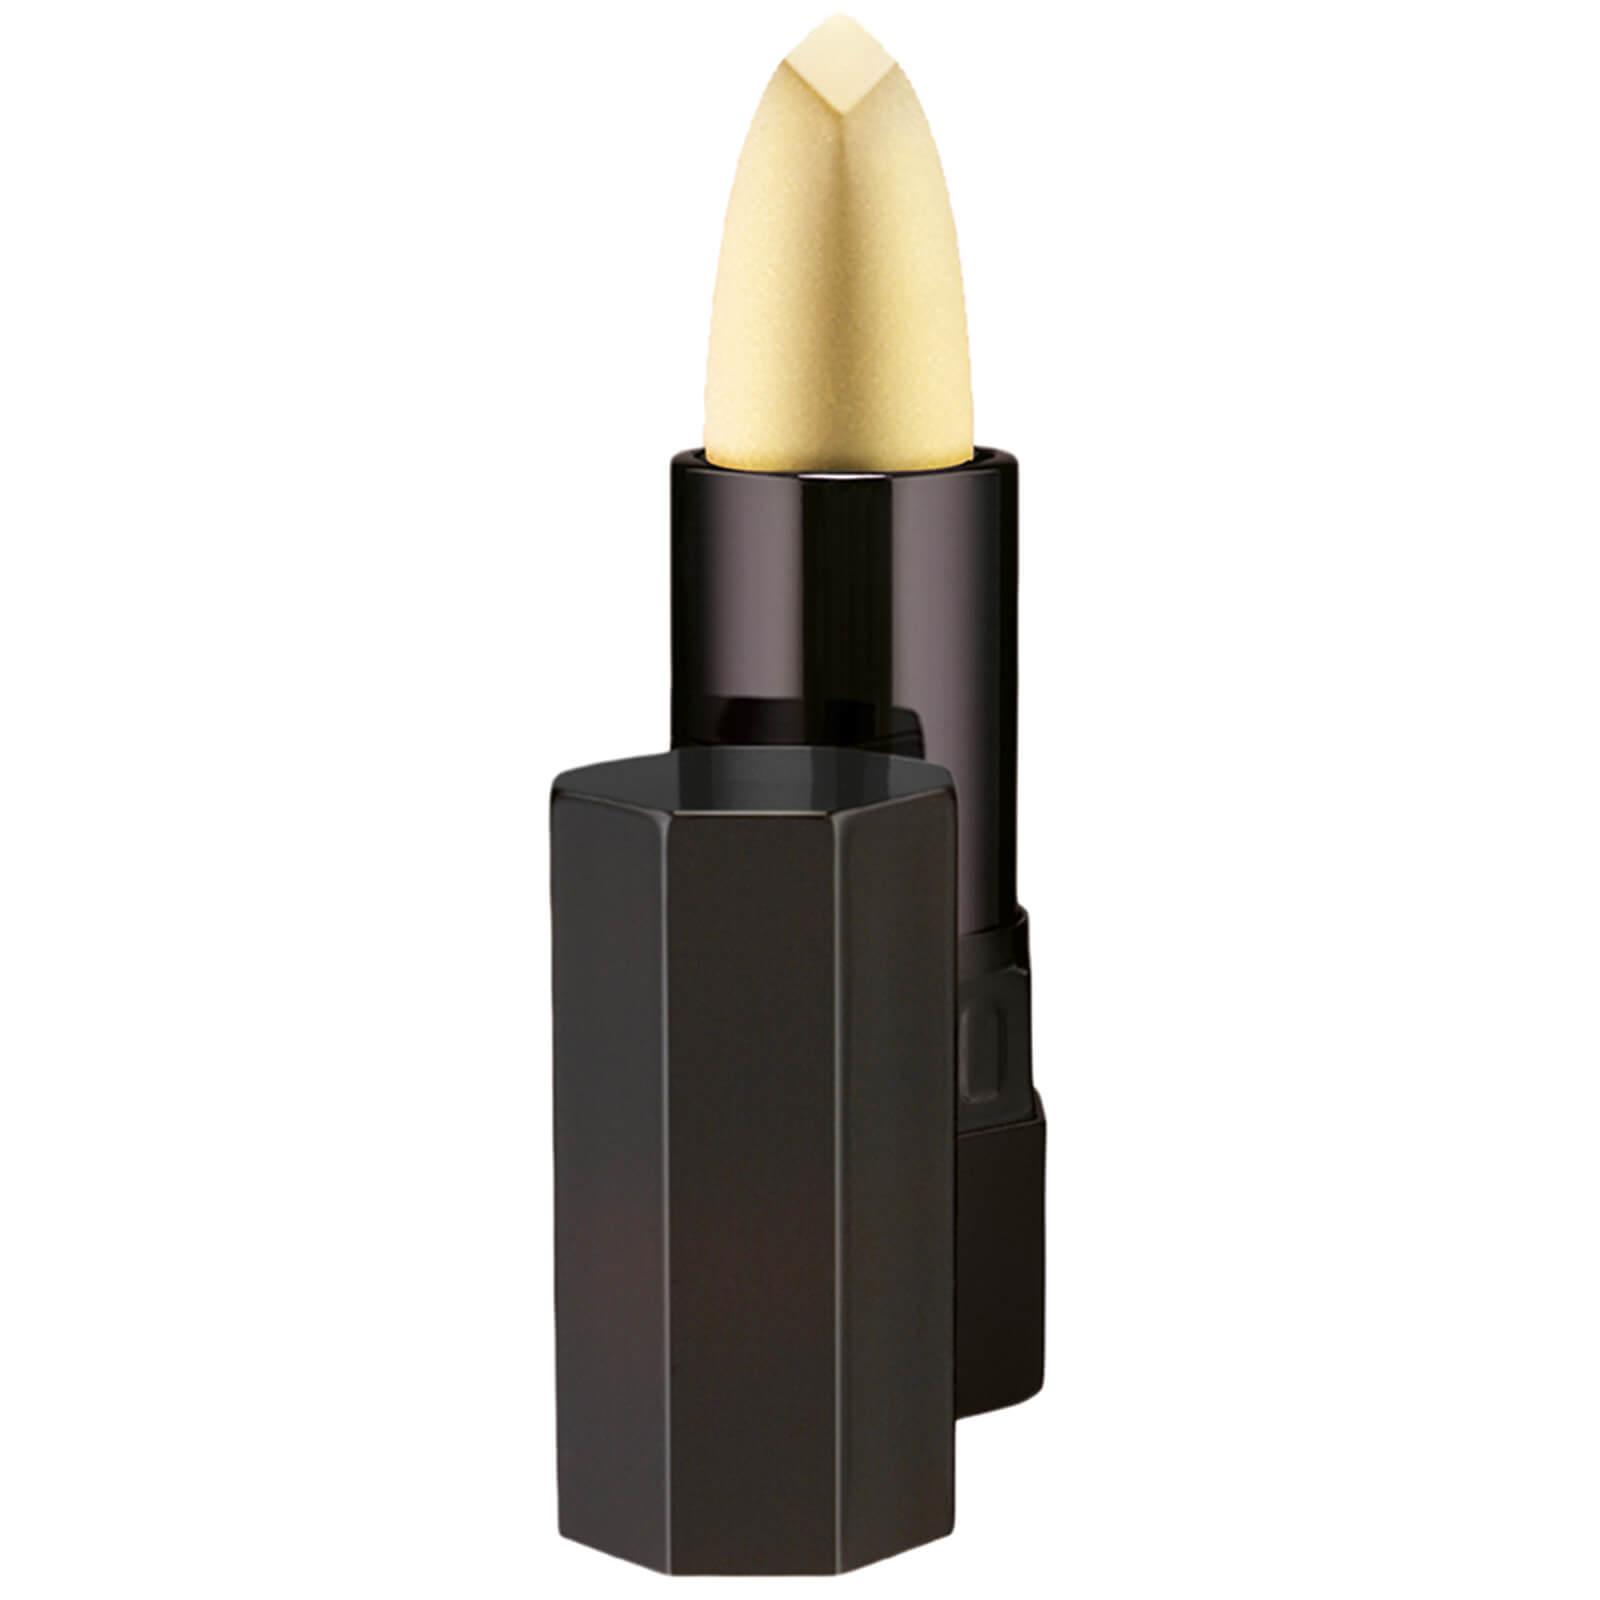 Serge Lutens Lipstick Fard à Lèvres Refill 2.3g (Various Shades) - N°24 Or frêle